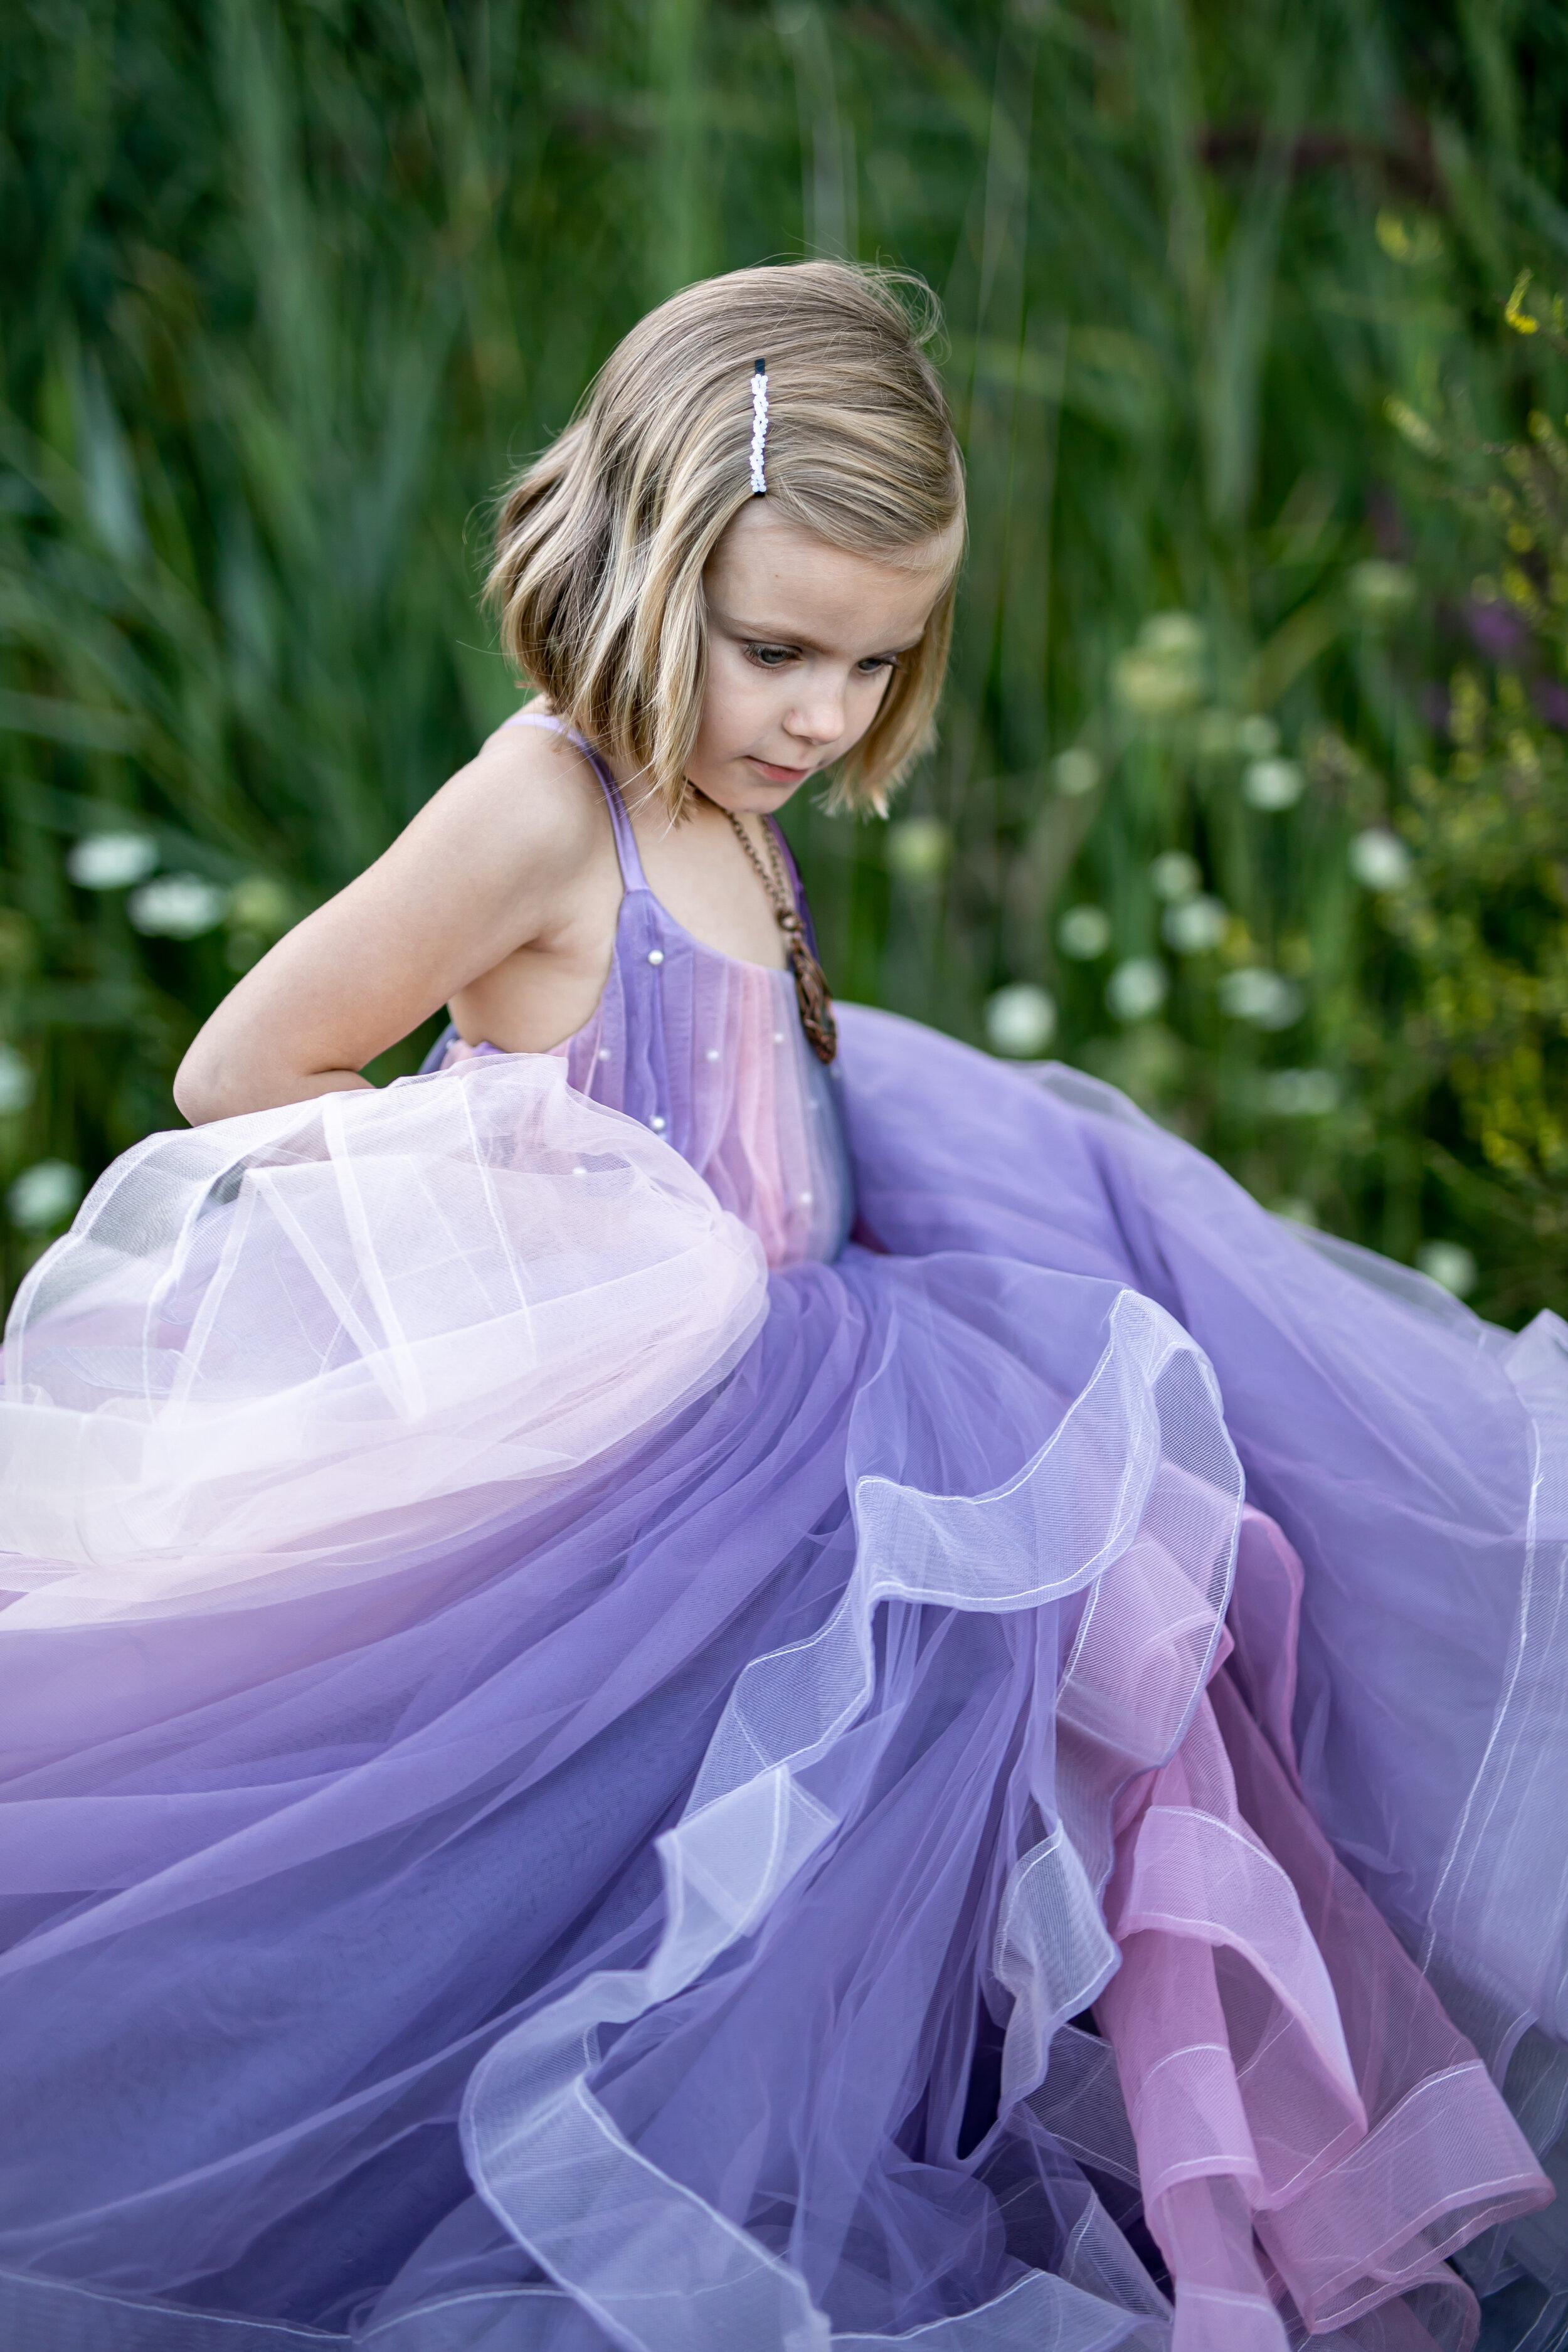 chicago illinois lake county illinois couture child-9071.jpg